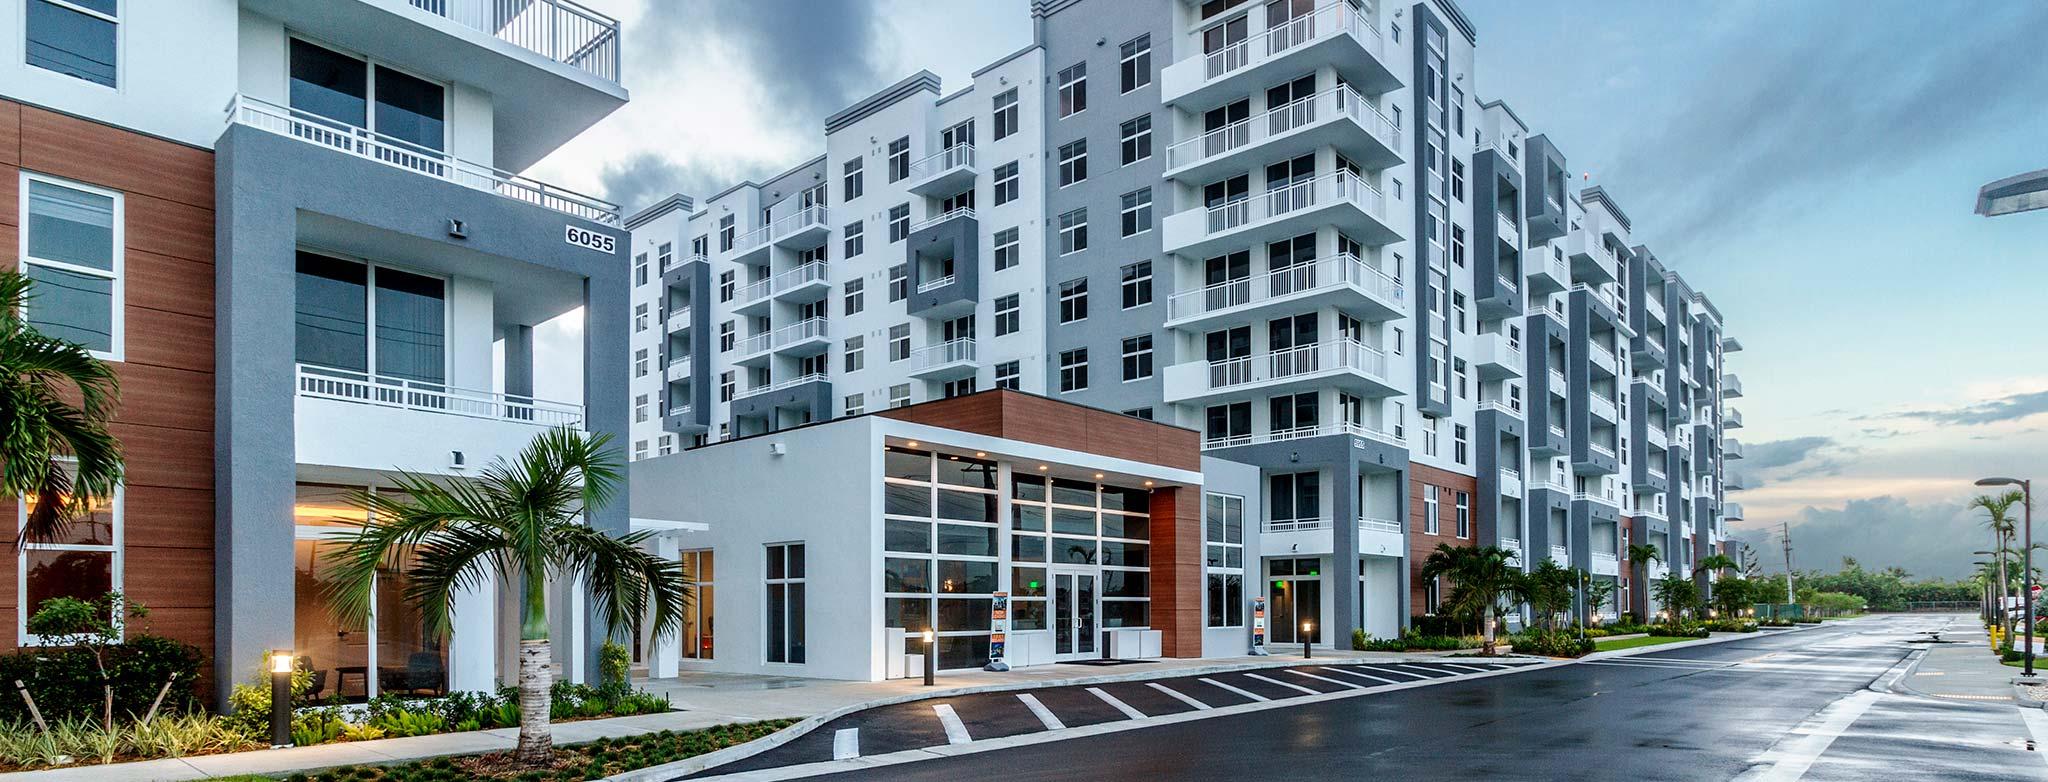 Landmark Doral Apartments